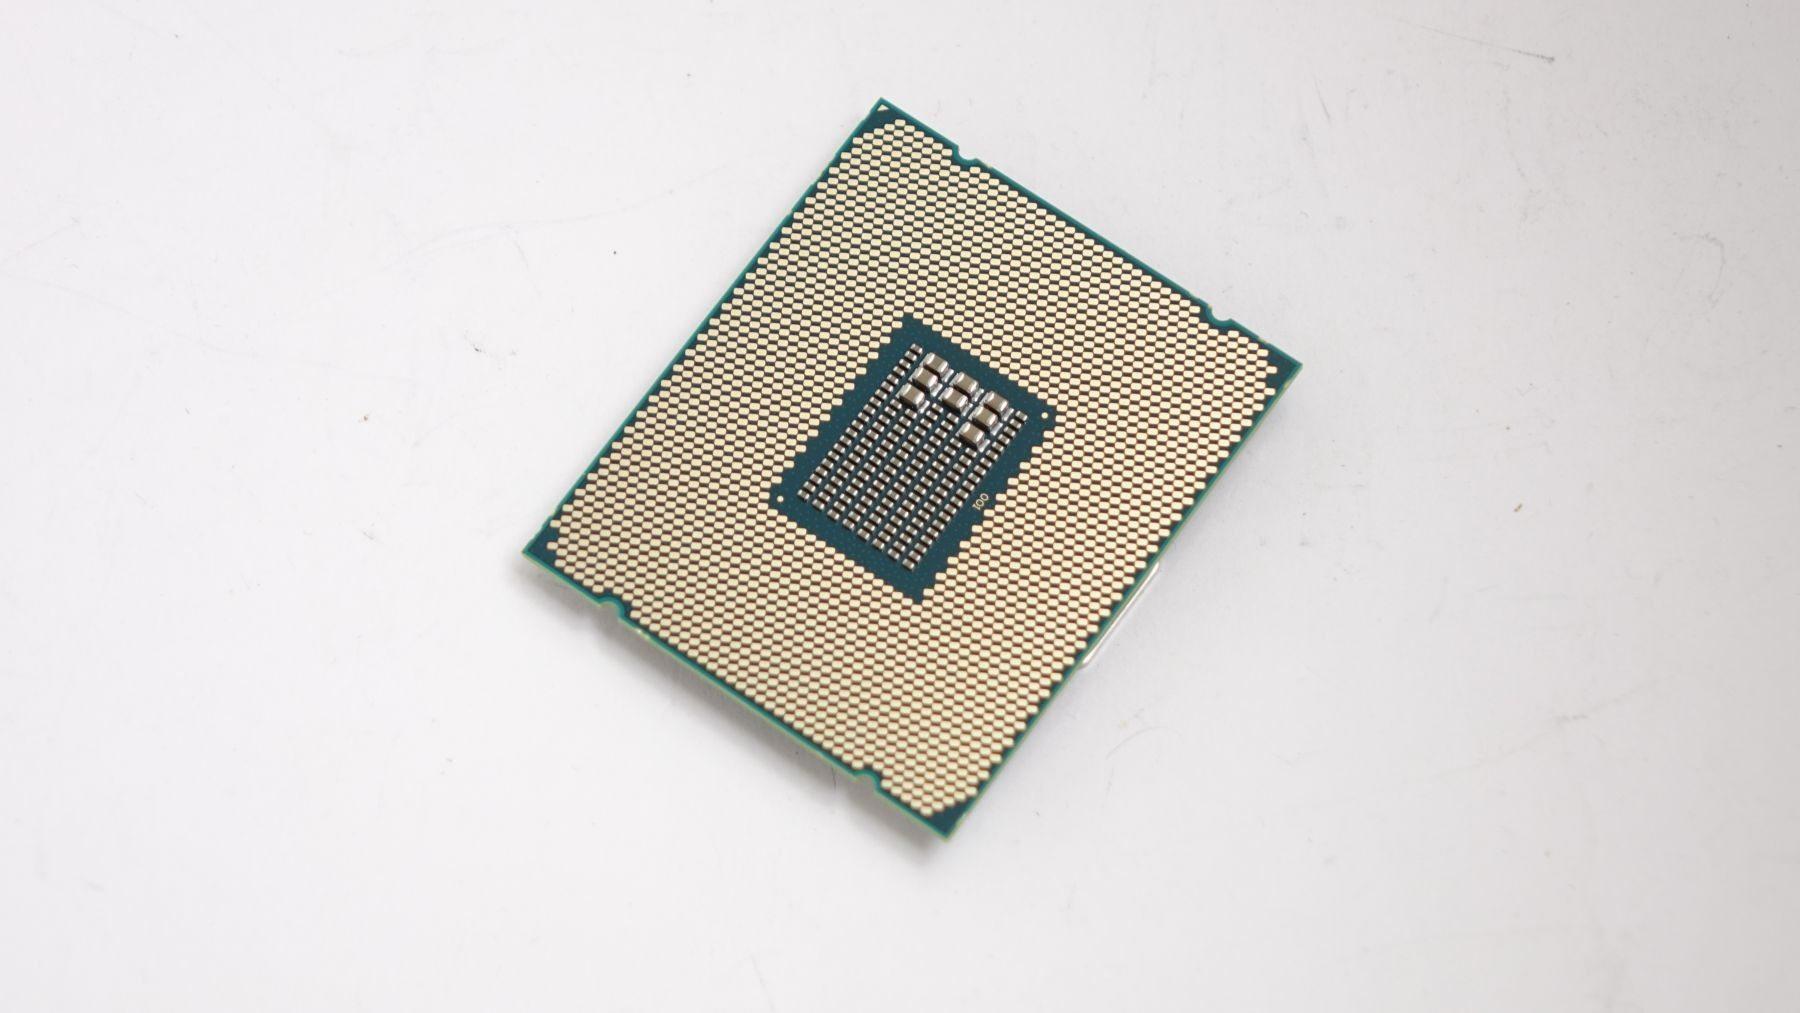 Intel Xeon E5-2609 v4 hero